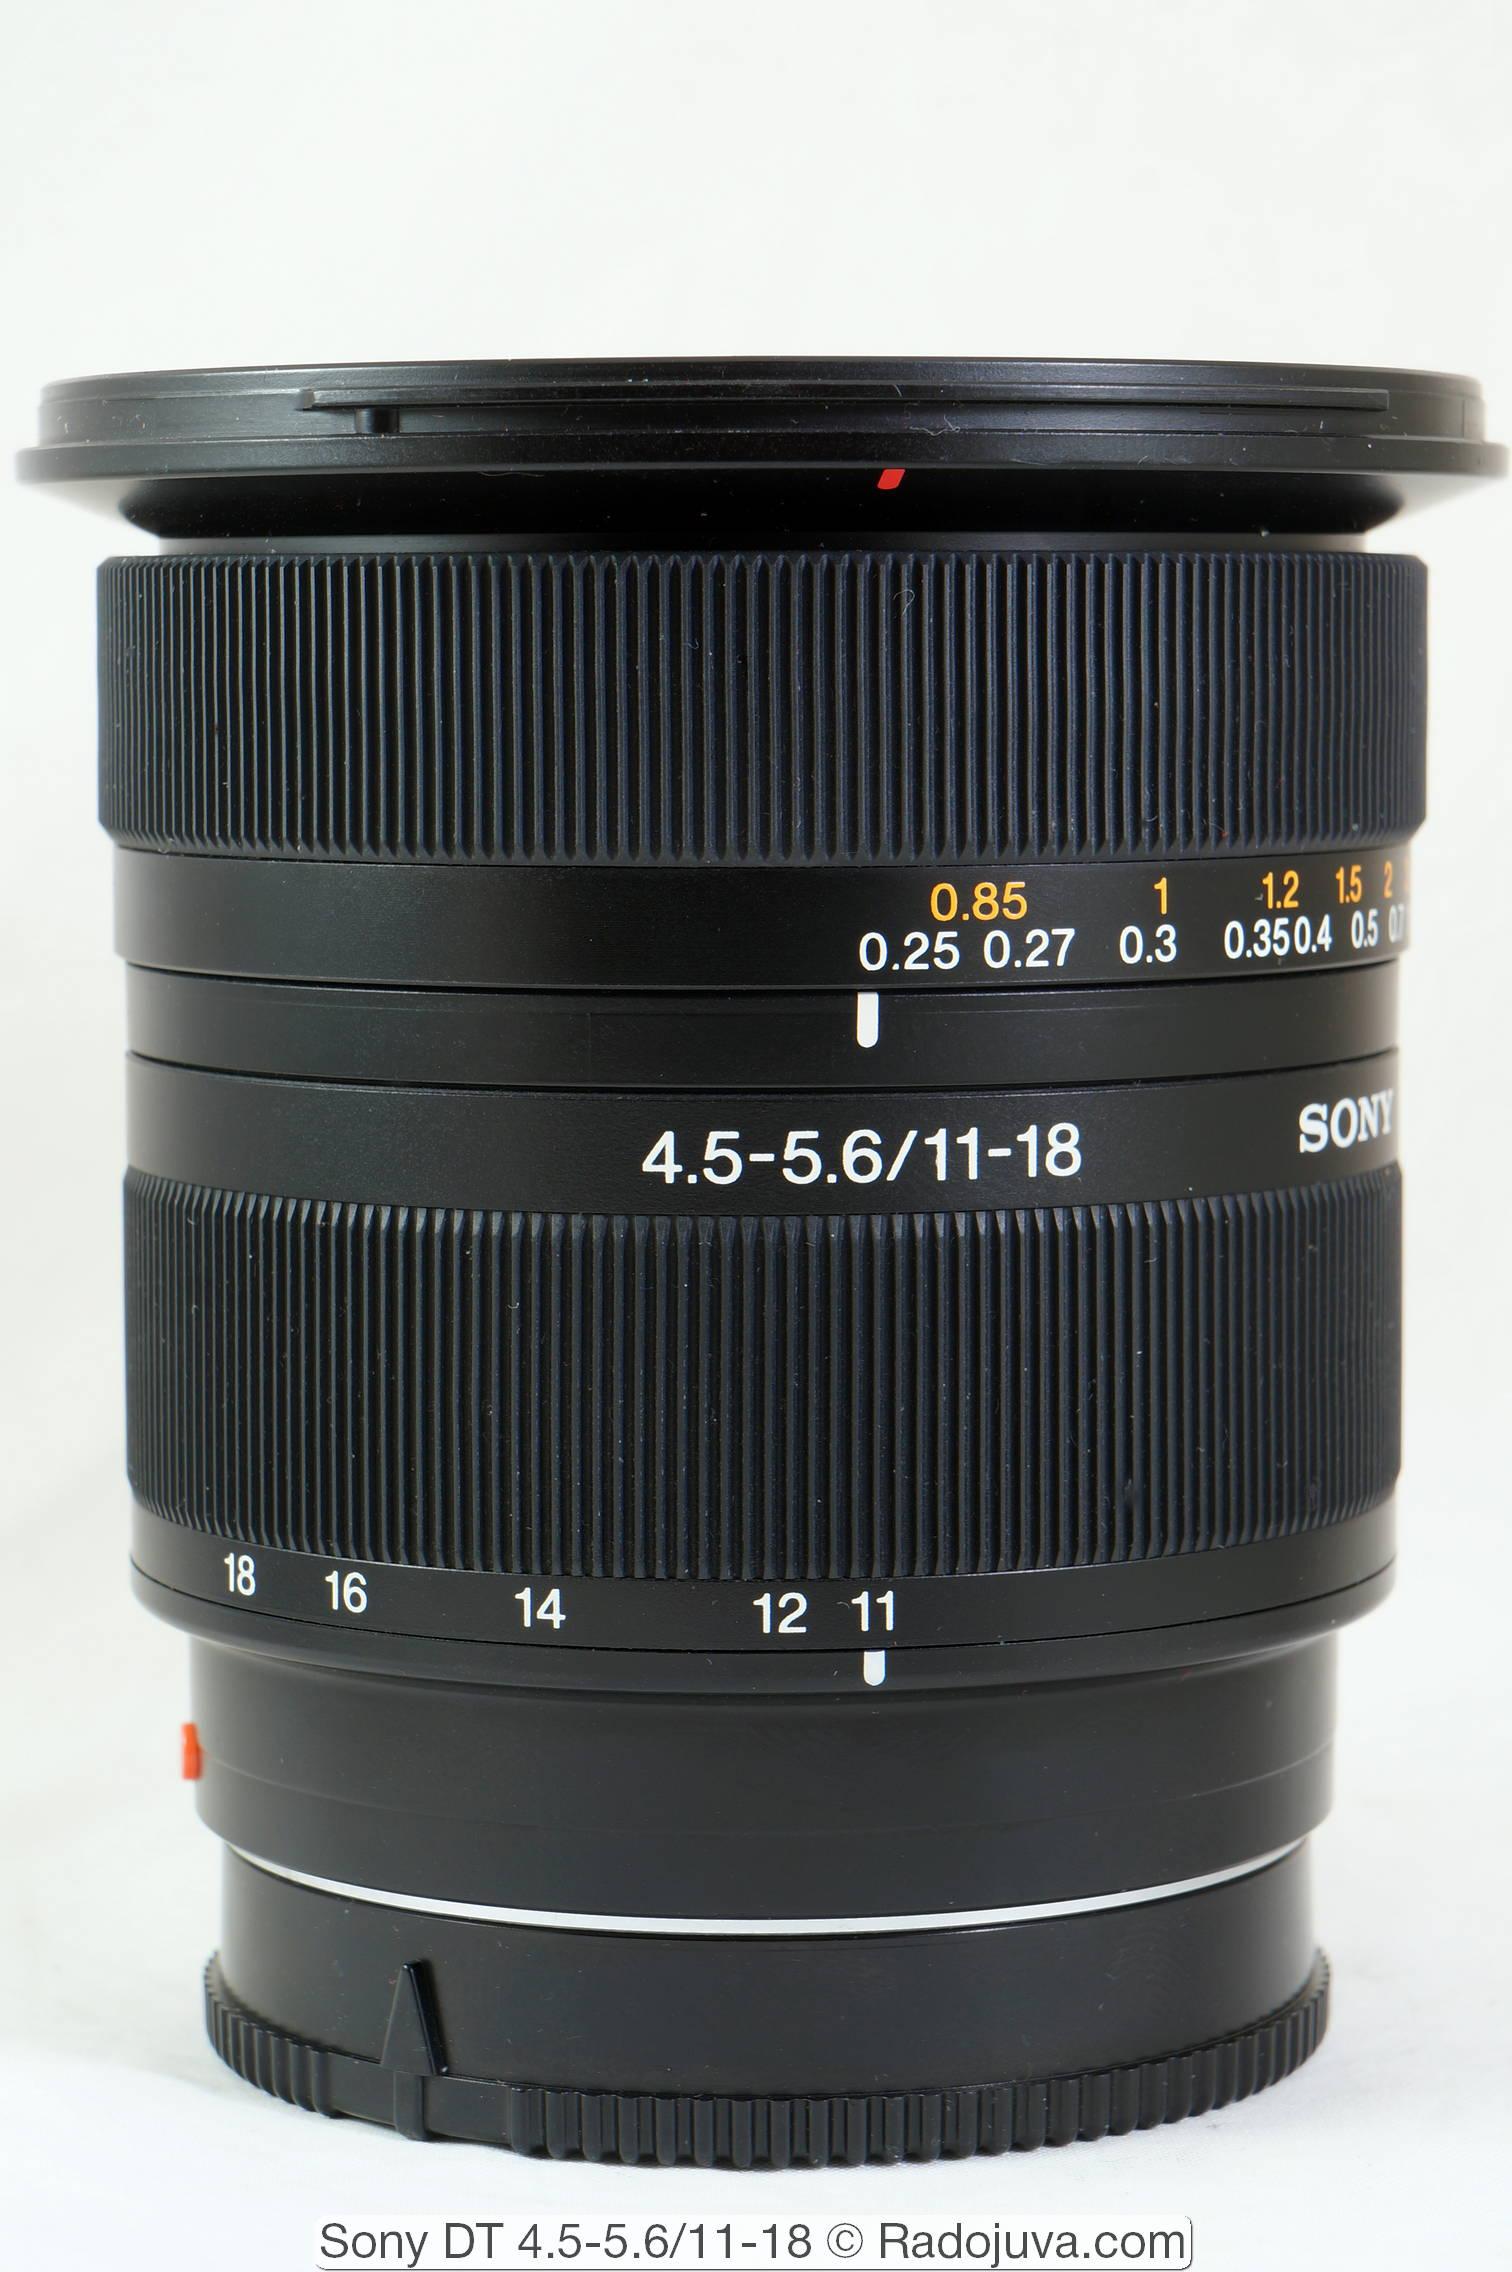 Sony DT 4.5-5.6/11-18